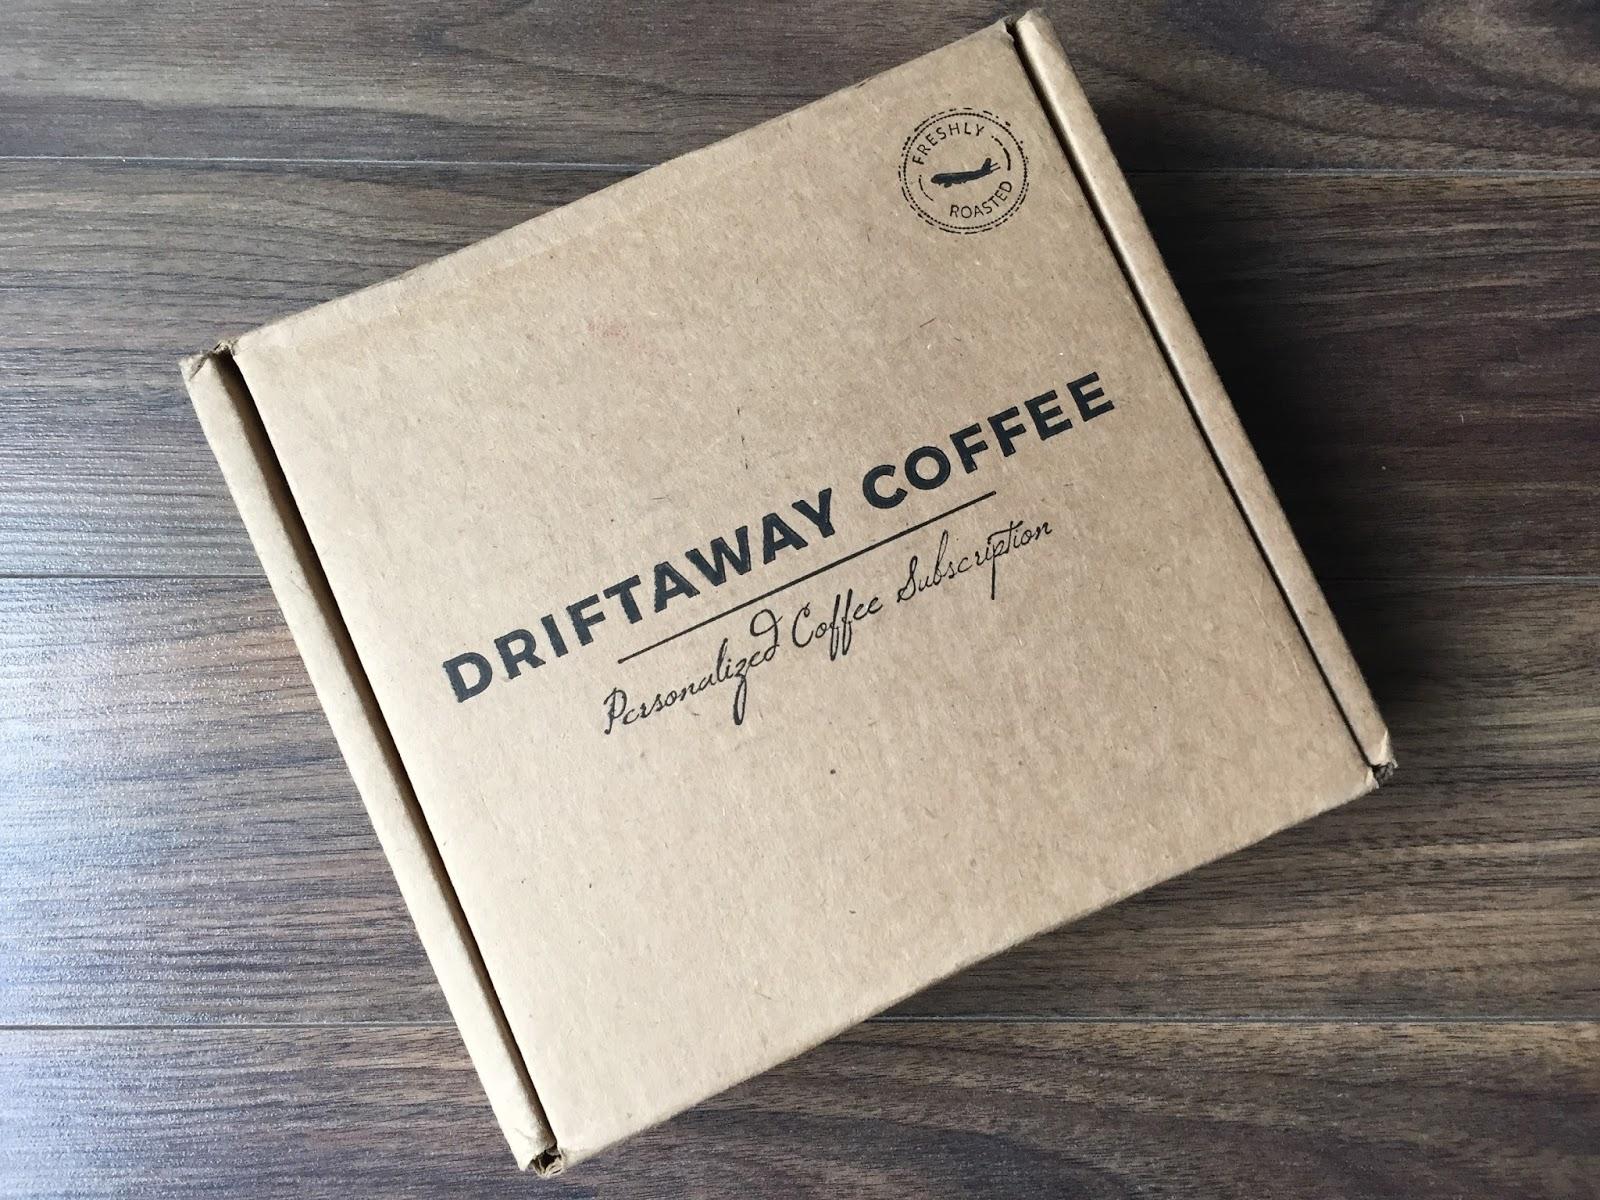 Driftaway coffee review november 2017 coffee subscription box reheart Choice Image